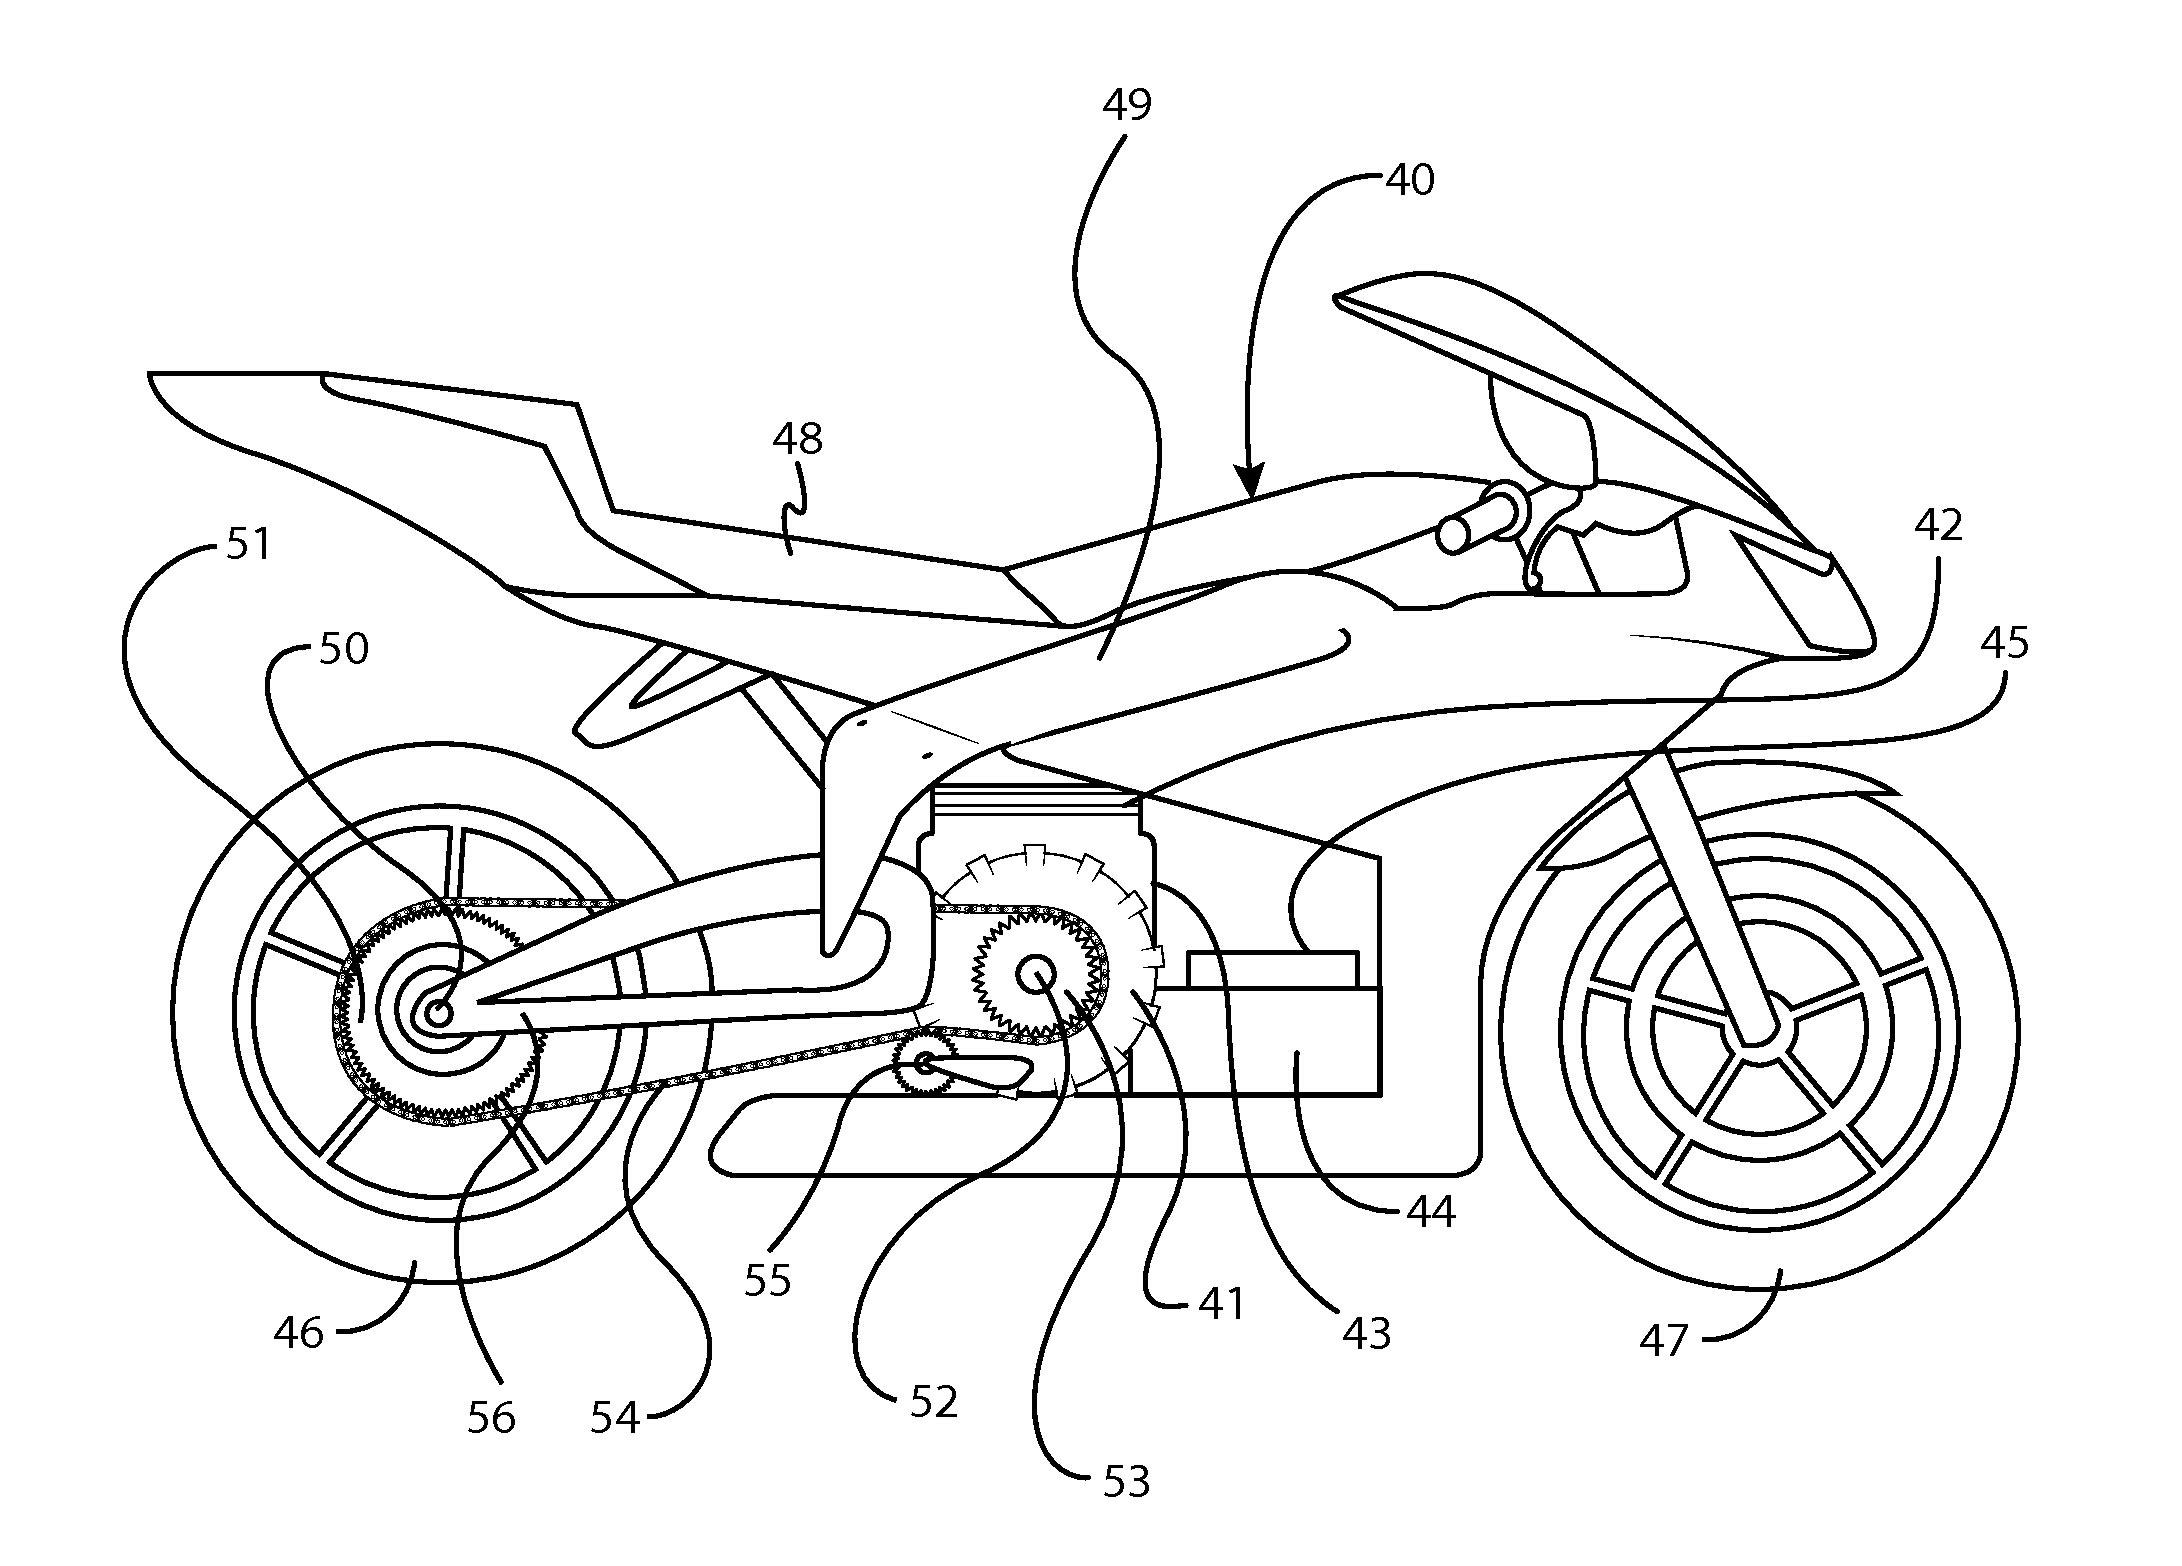 Erik Buell Racing Patents Hybrid Motorcycle Design - Asphalt & Rubber